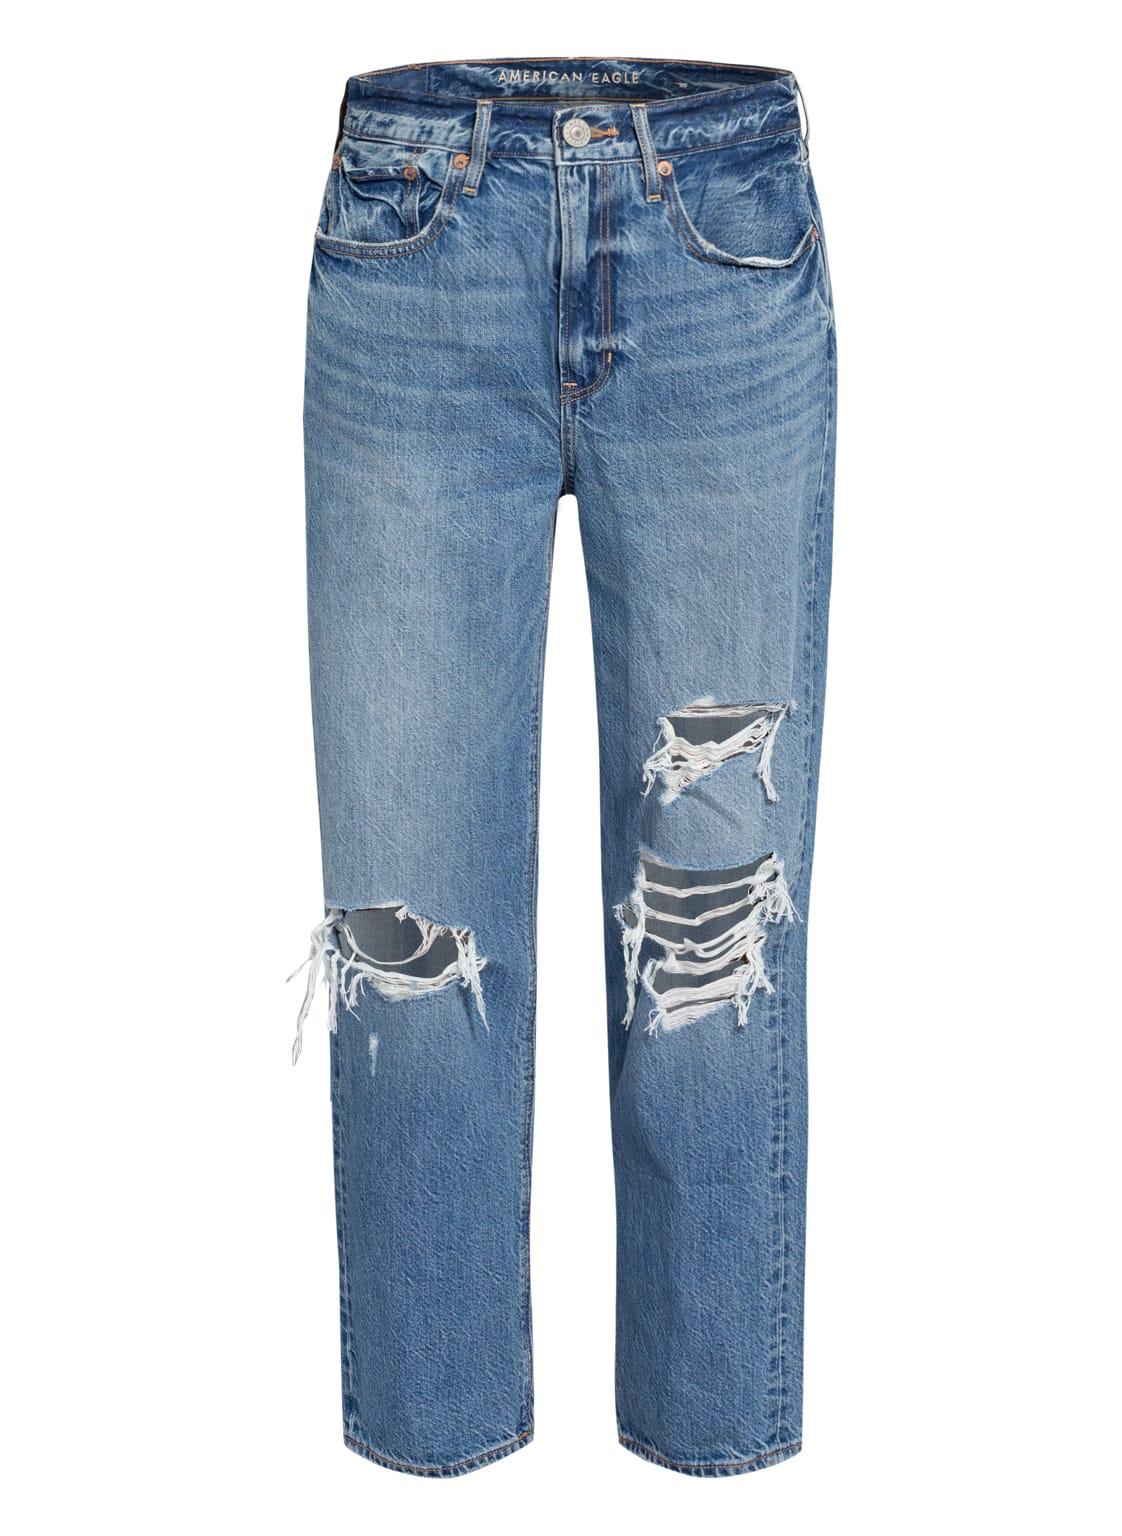 Image of American Eagle Boyfriend Jeans blau